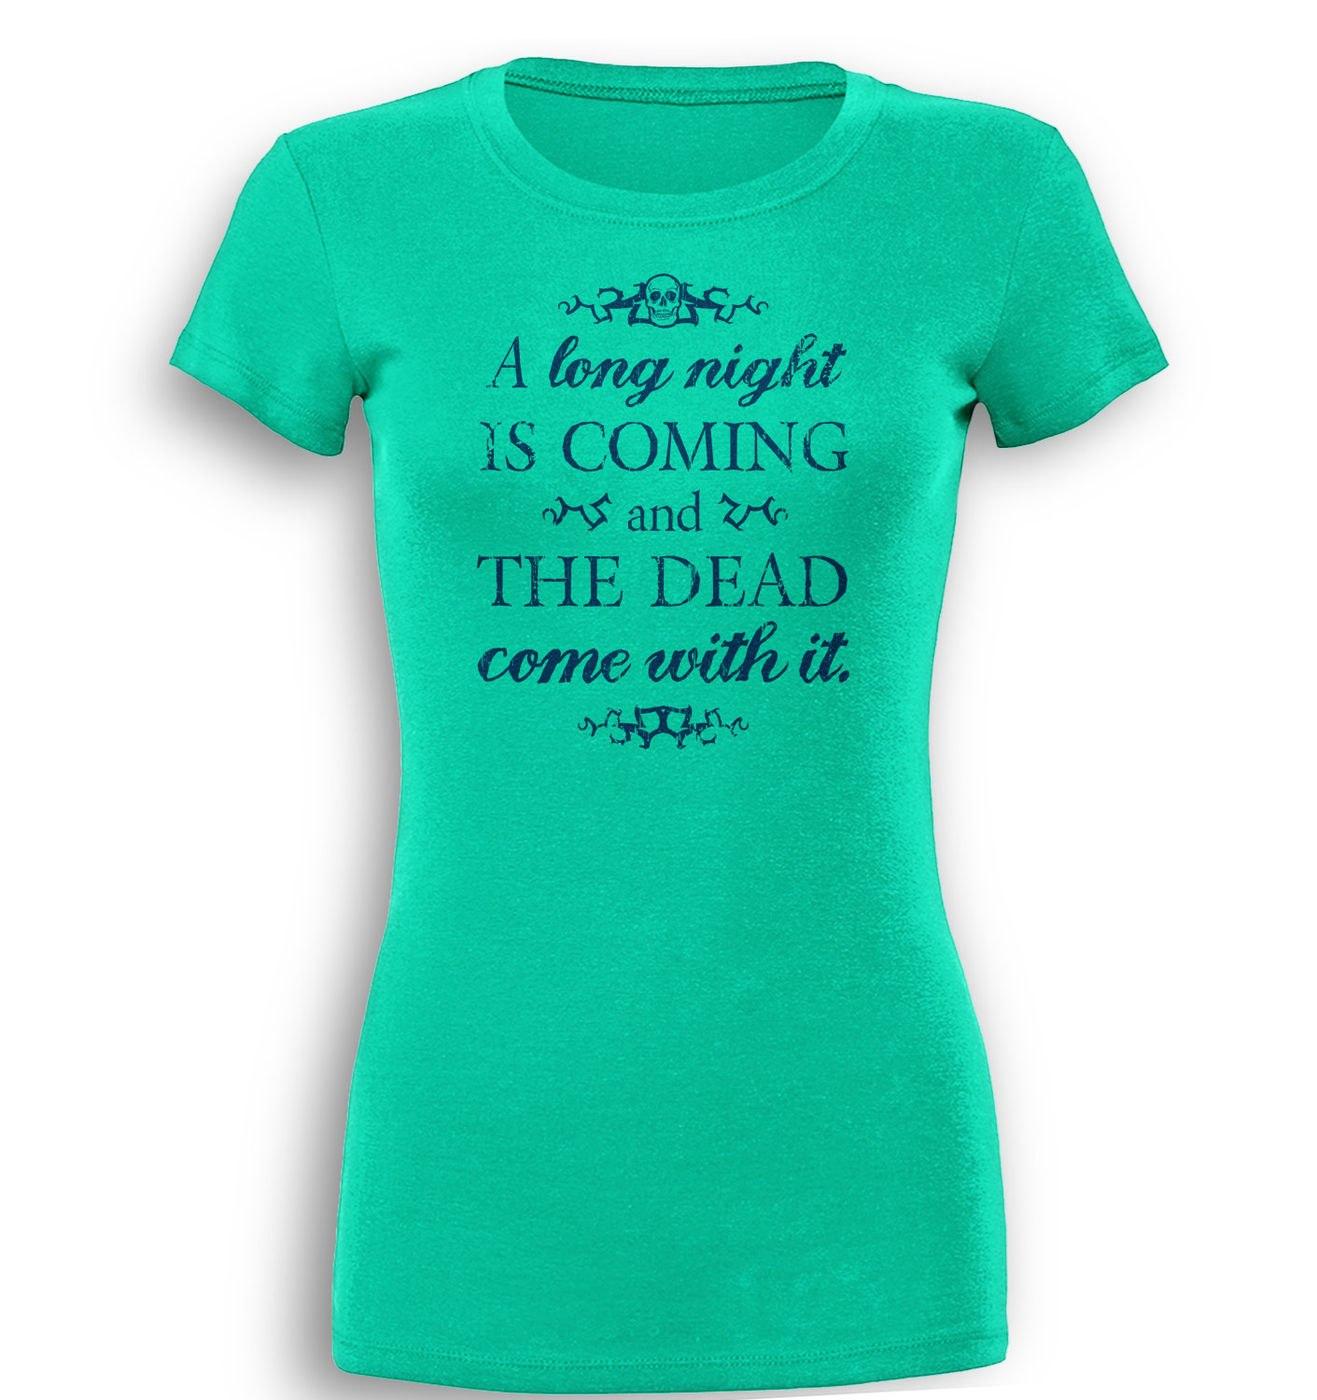 Long Night premium womens t-shirt by Something Geeky